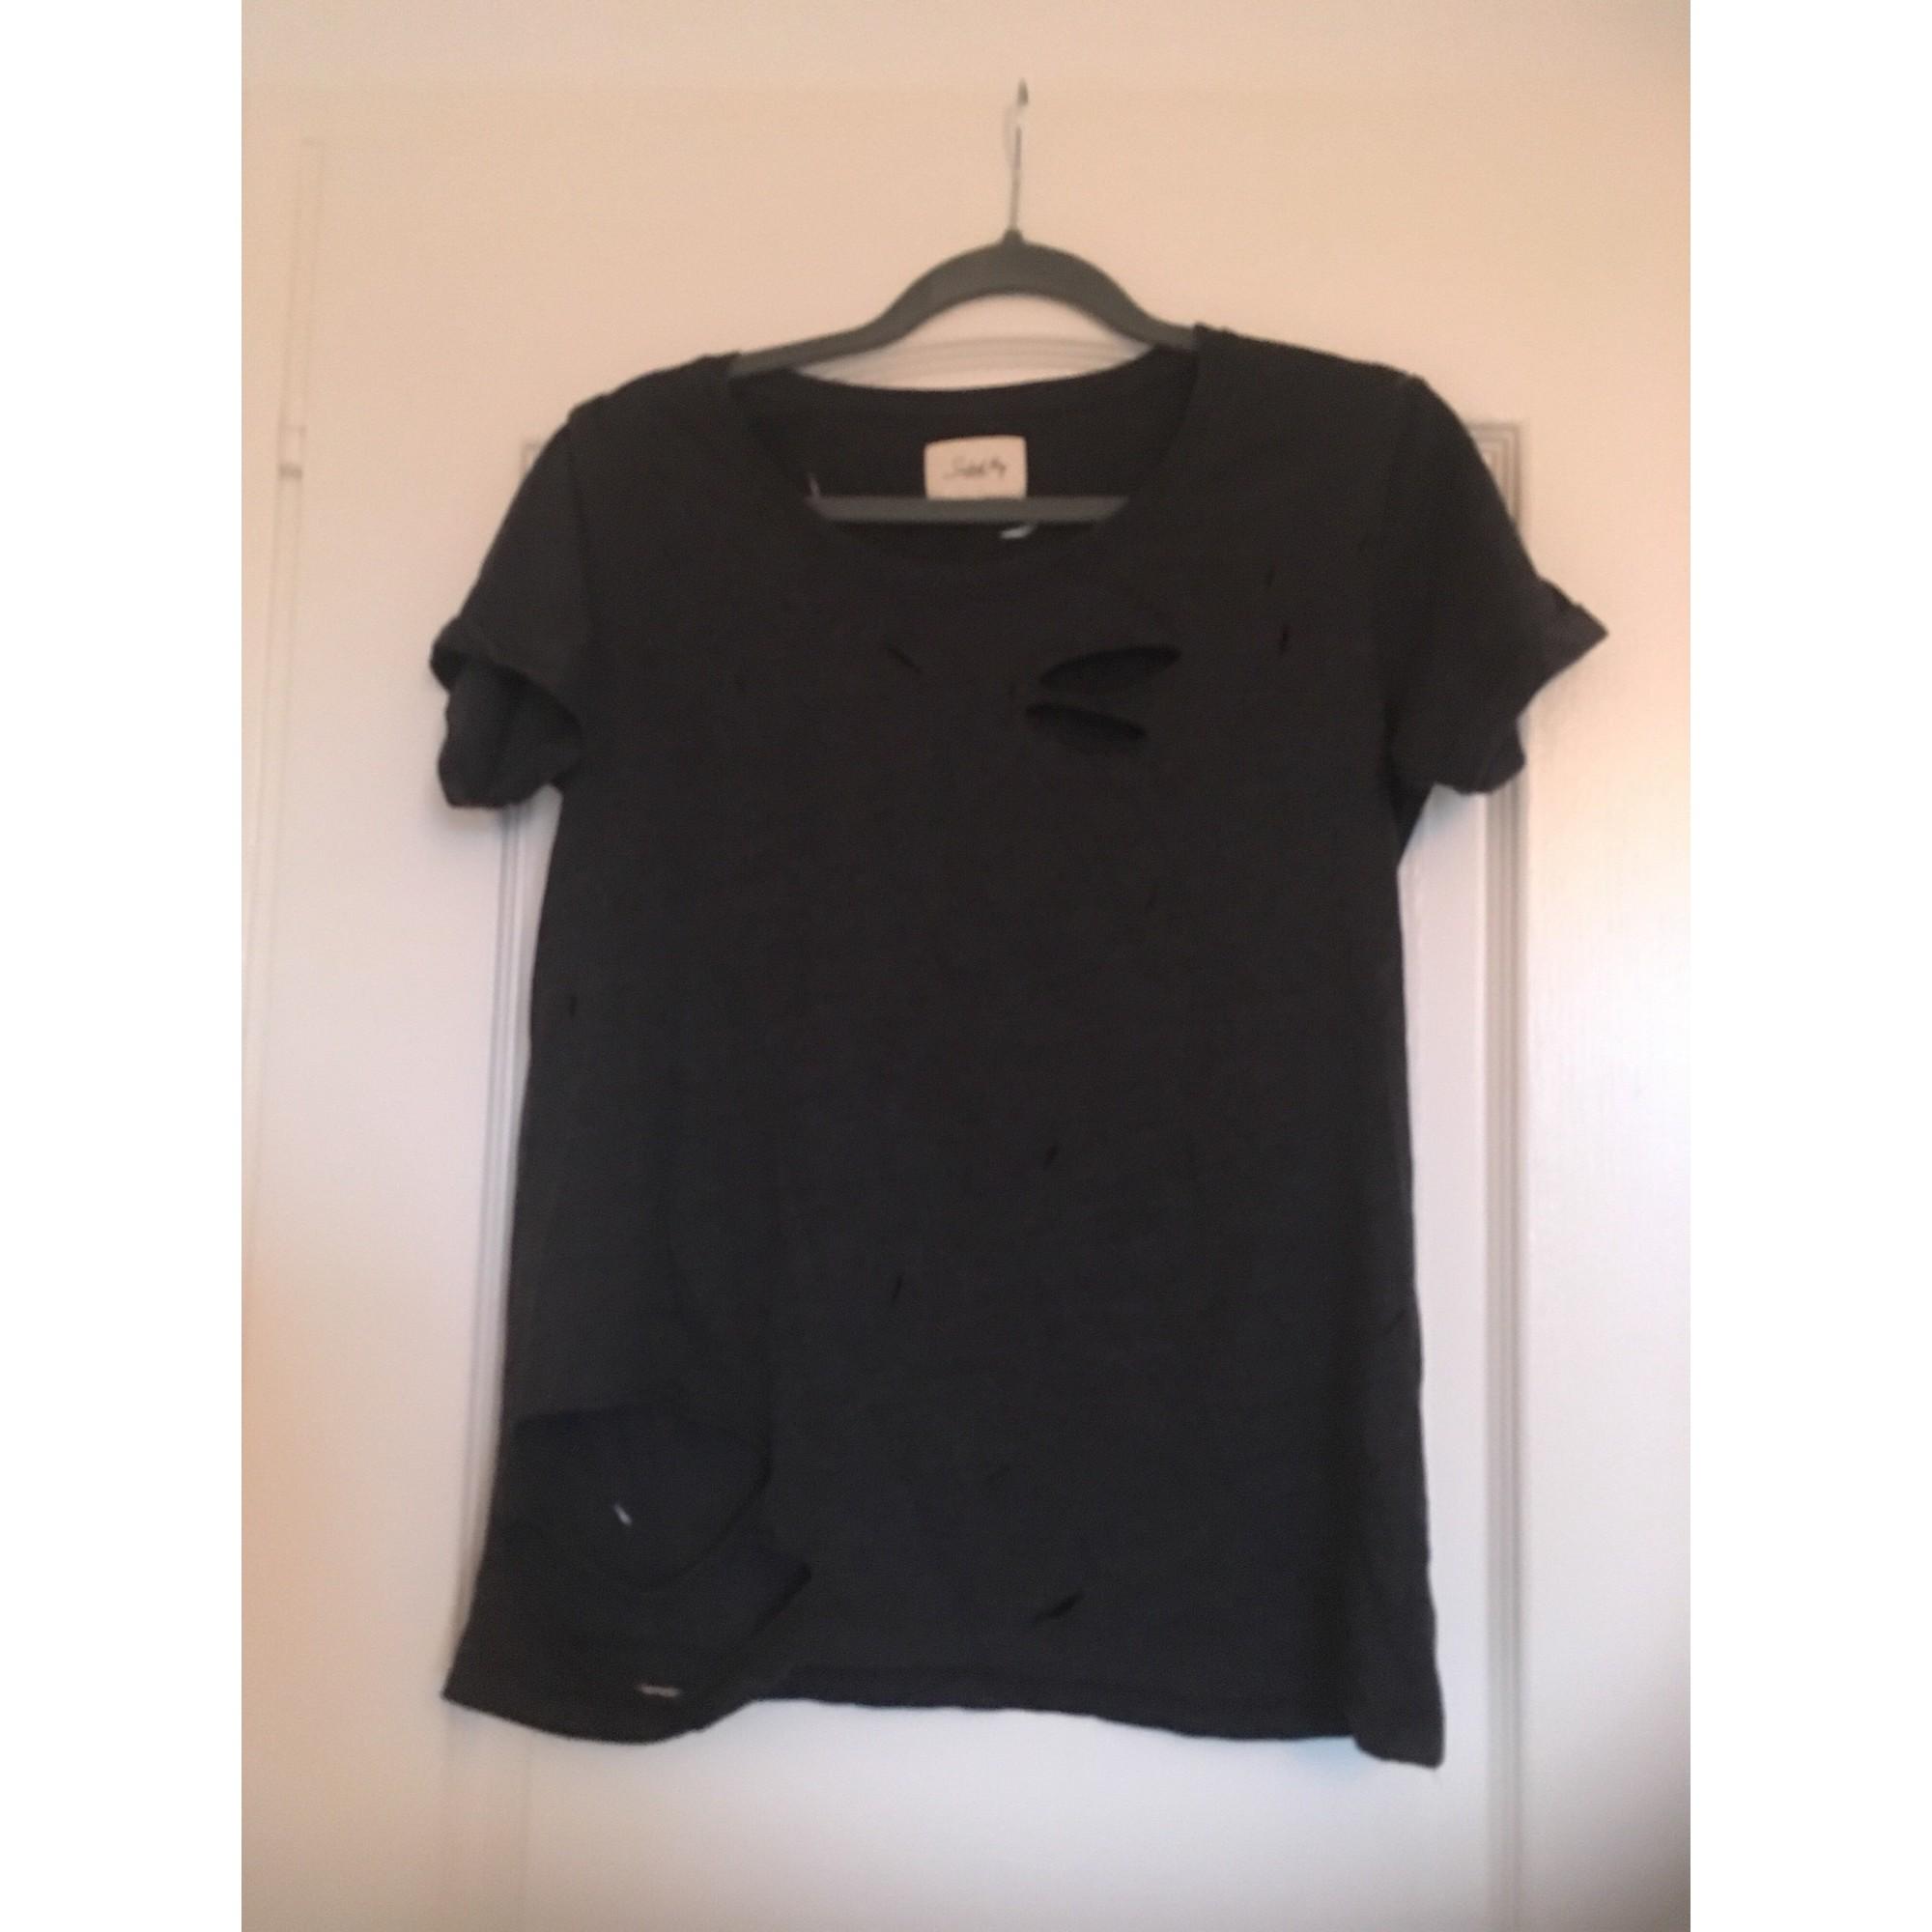 Top, tee-shirt SCHOOL RAG Gris, anthracite